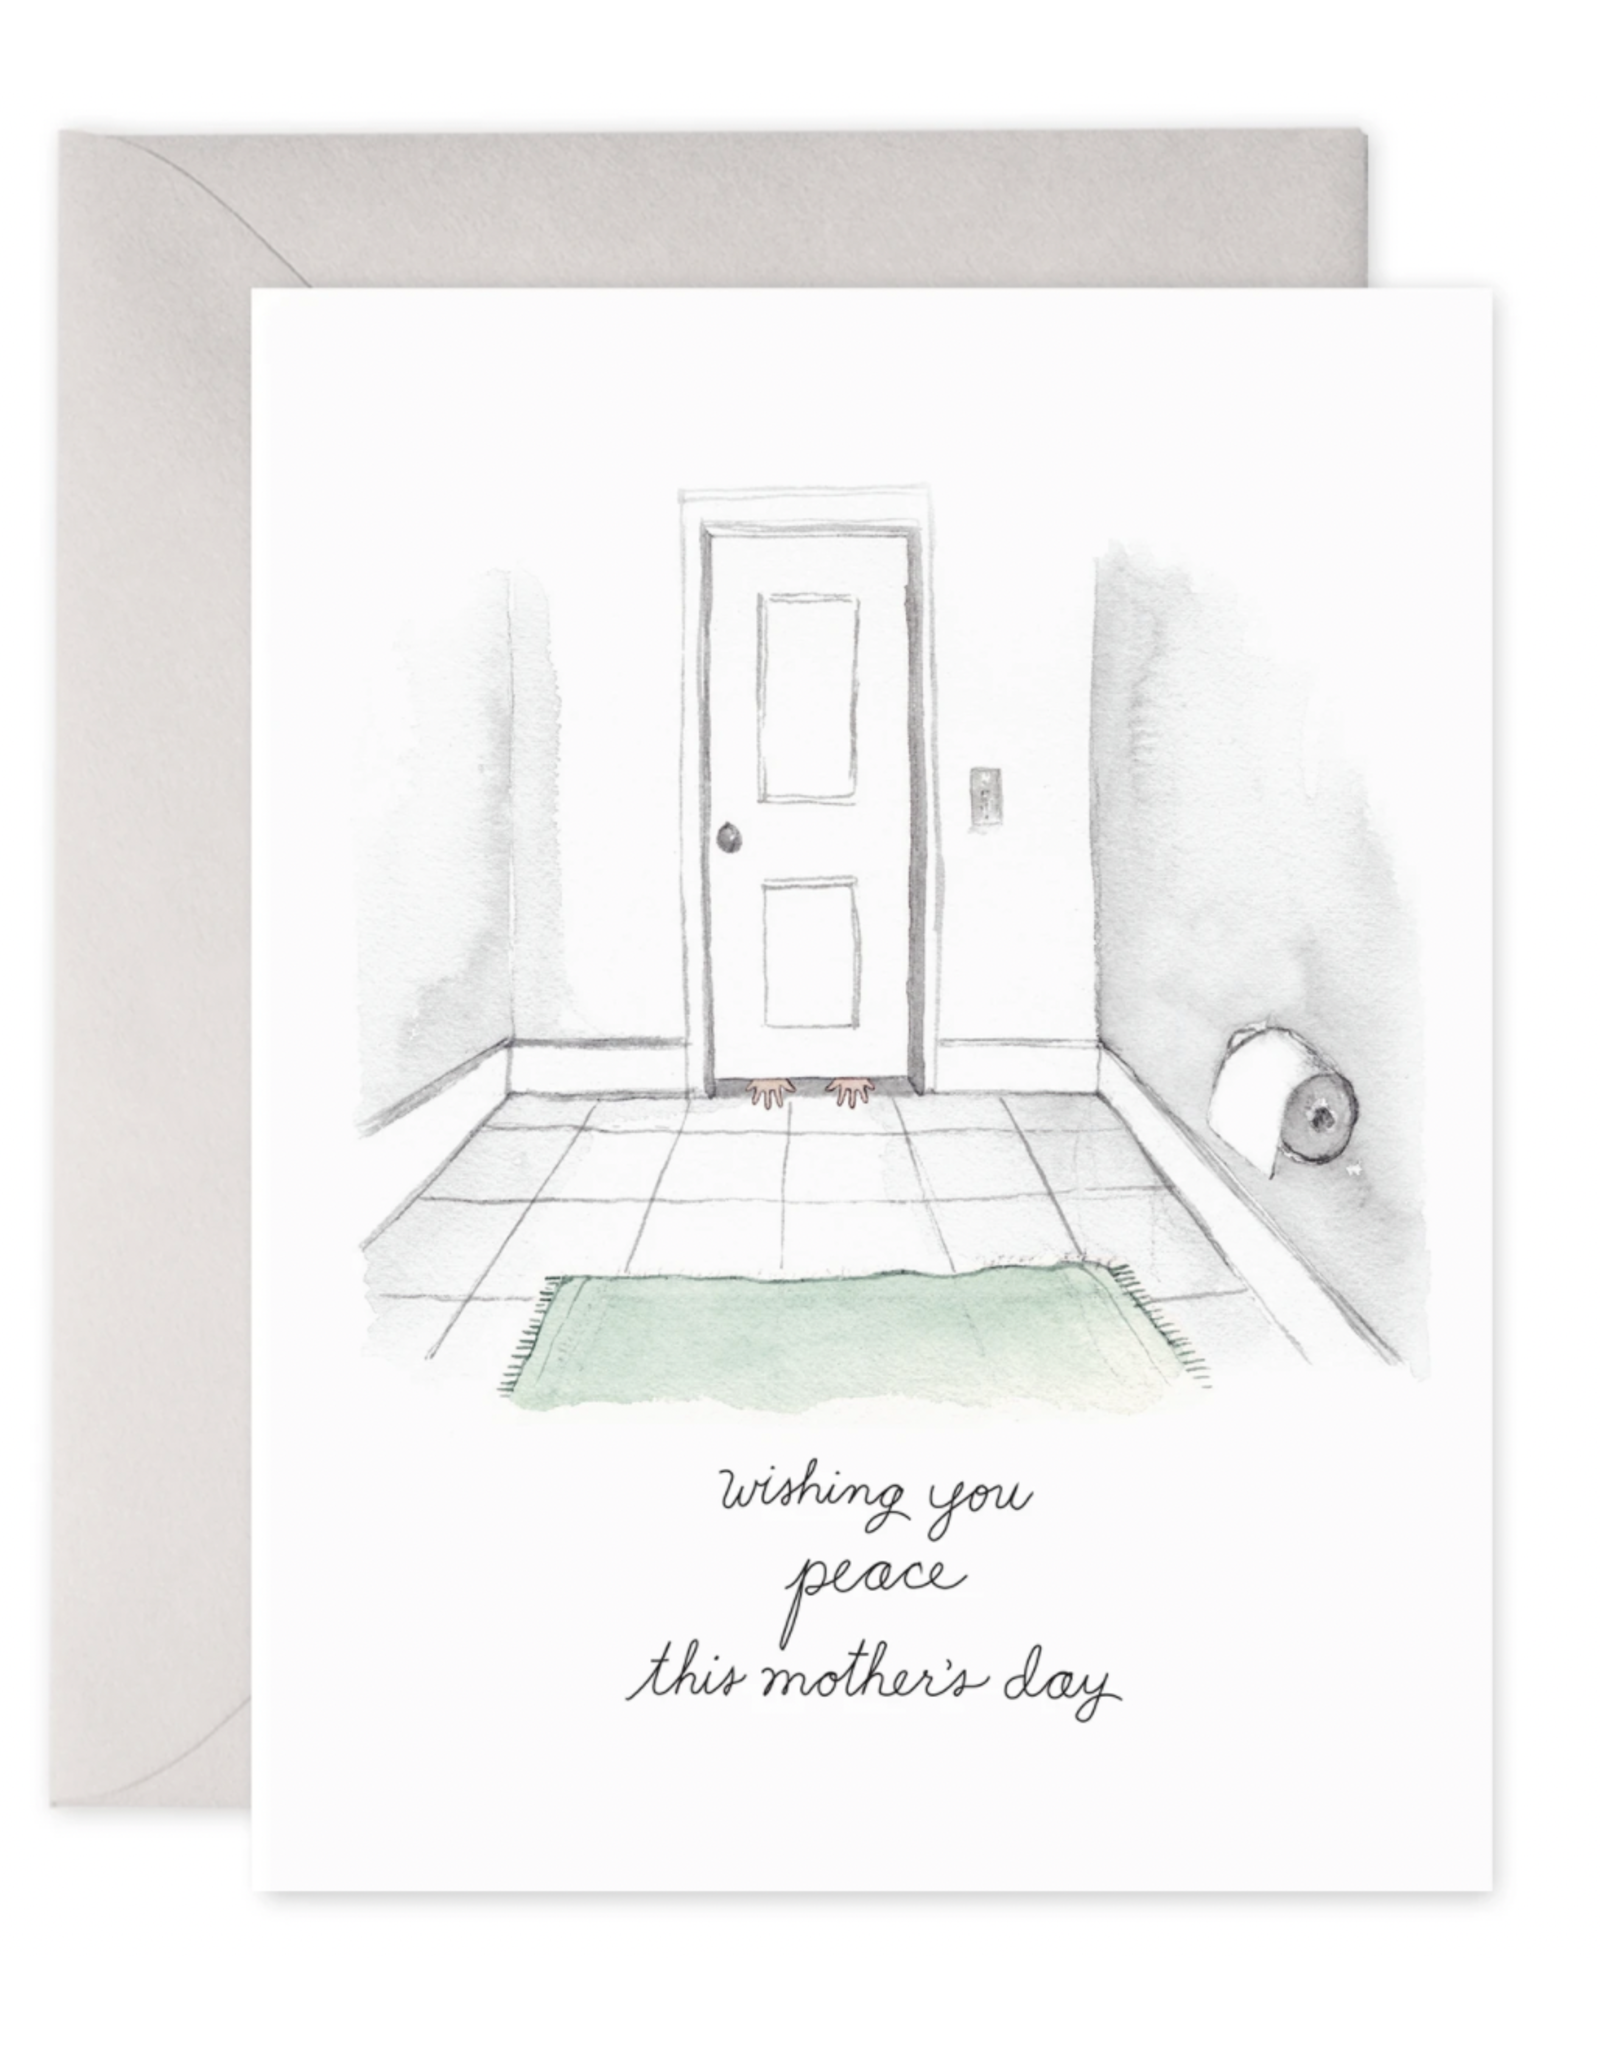 E. Frances Bathroom Peace Card